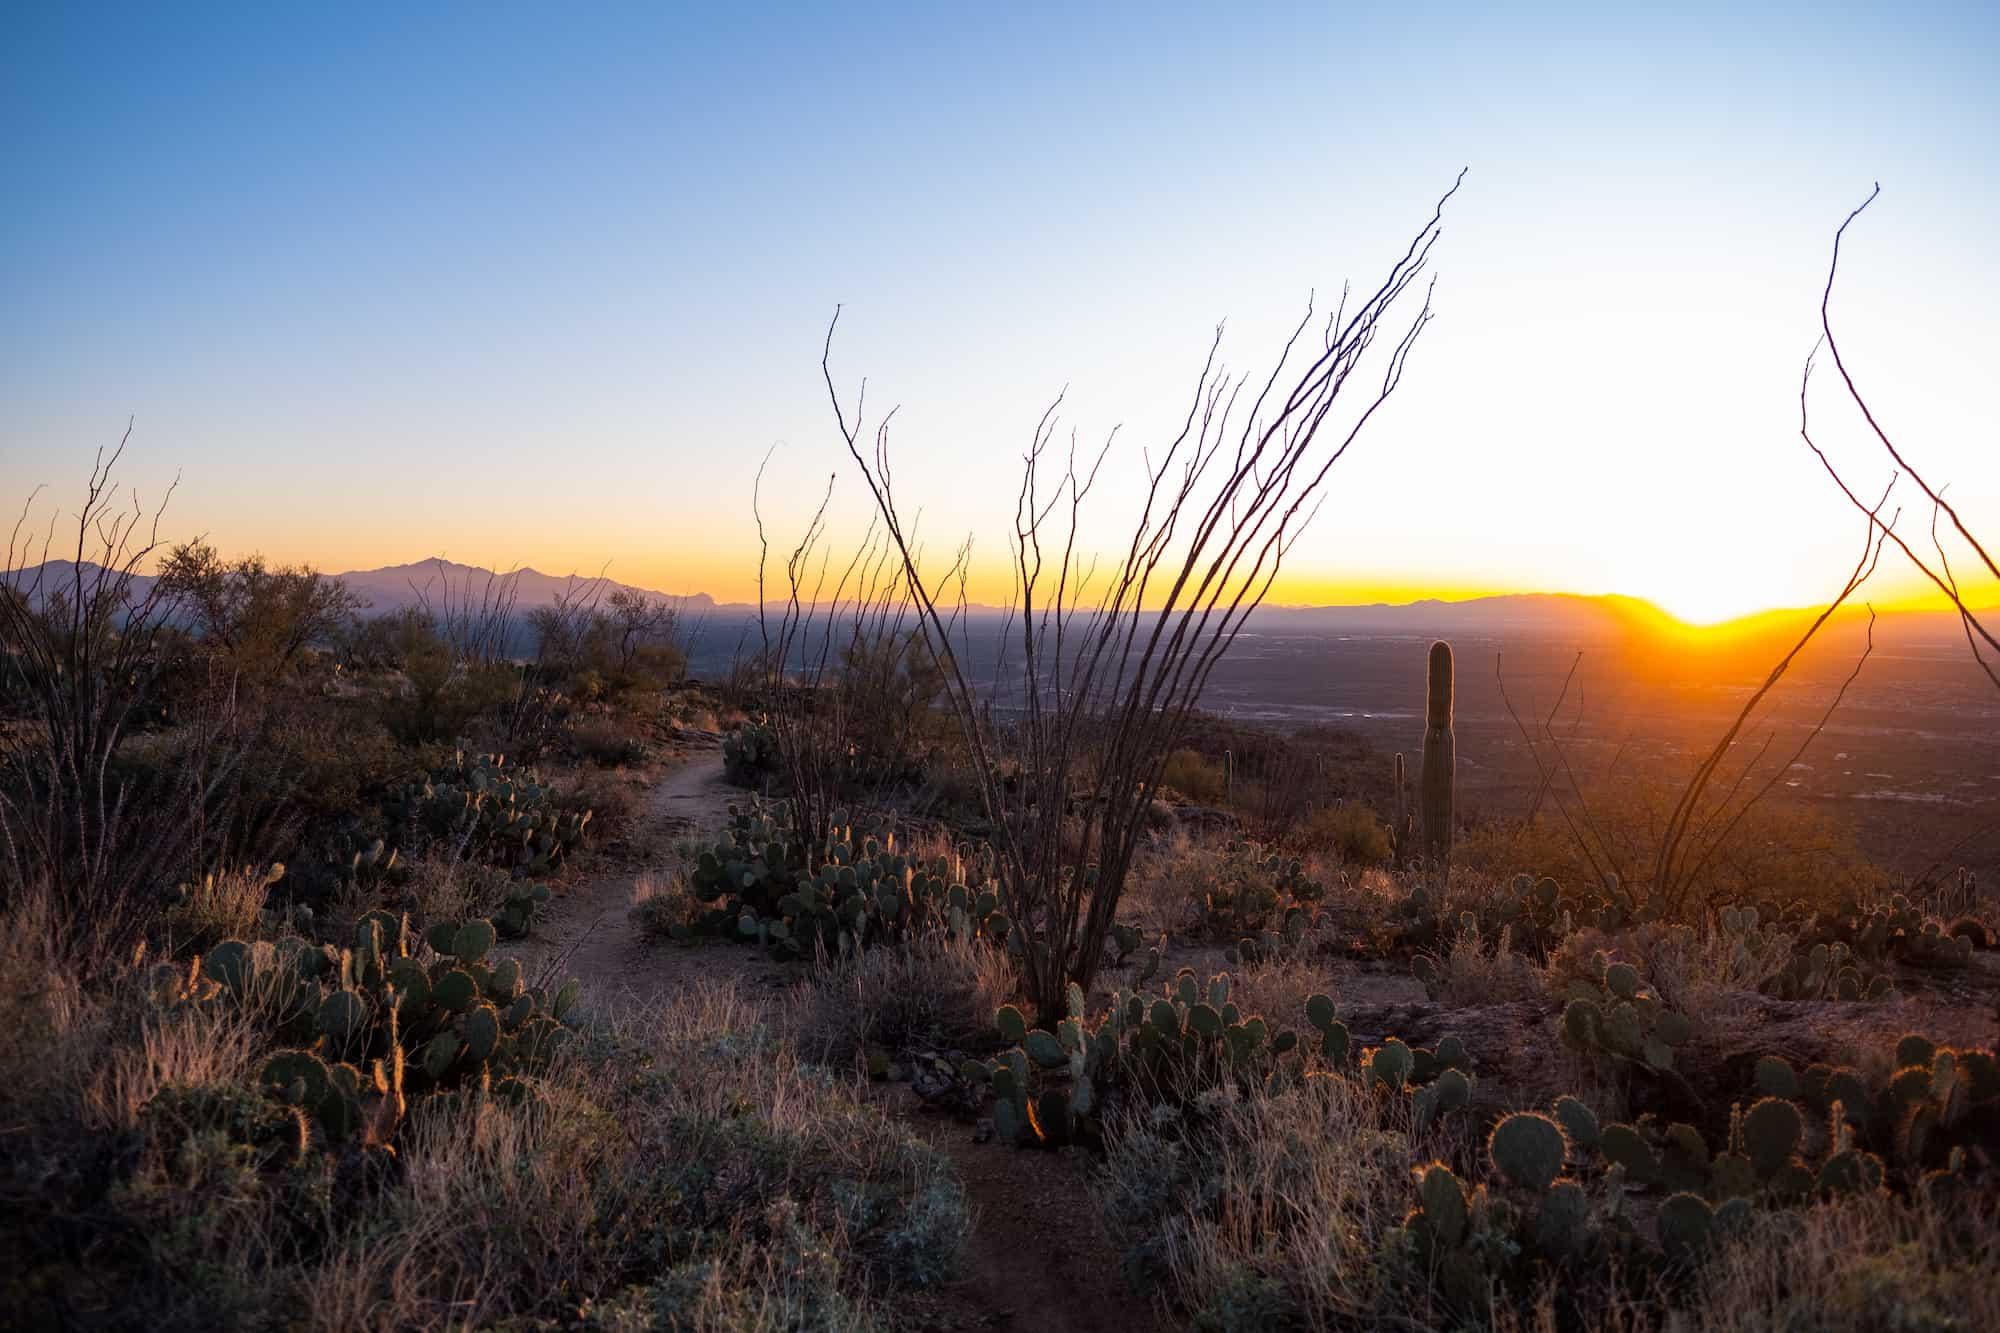 Sunset Landscape Hike Weekend in Tucson